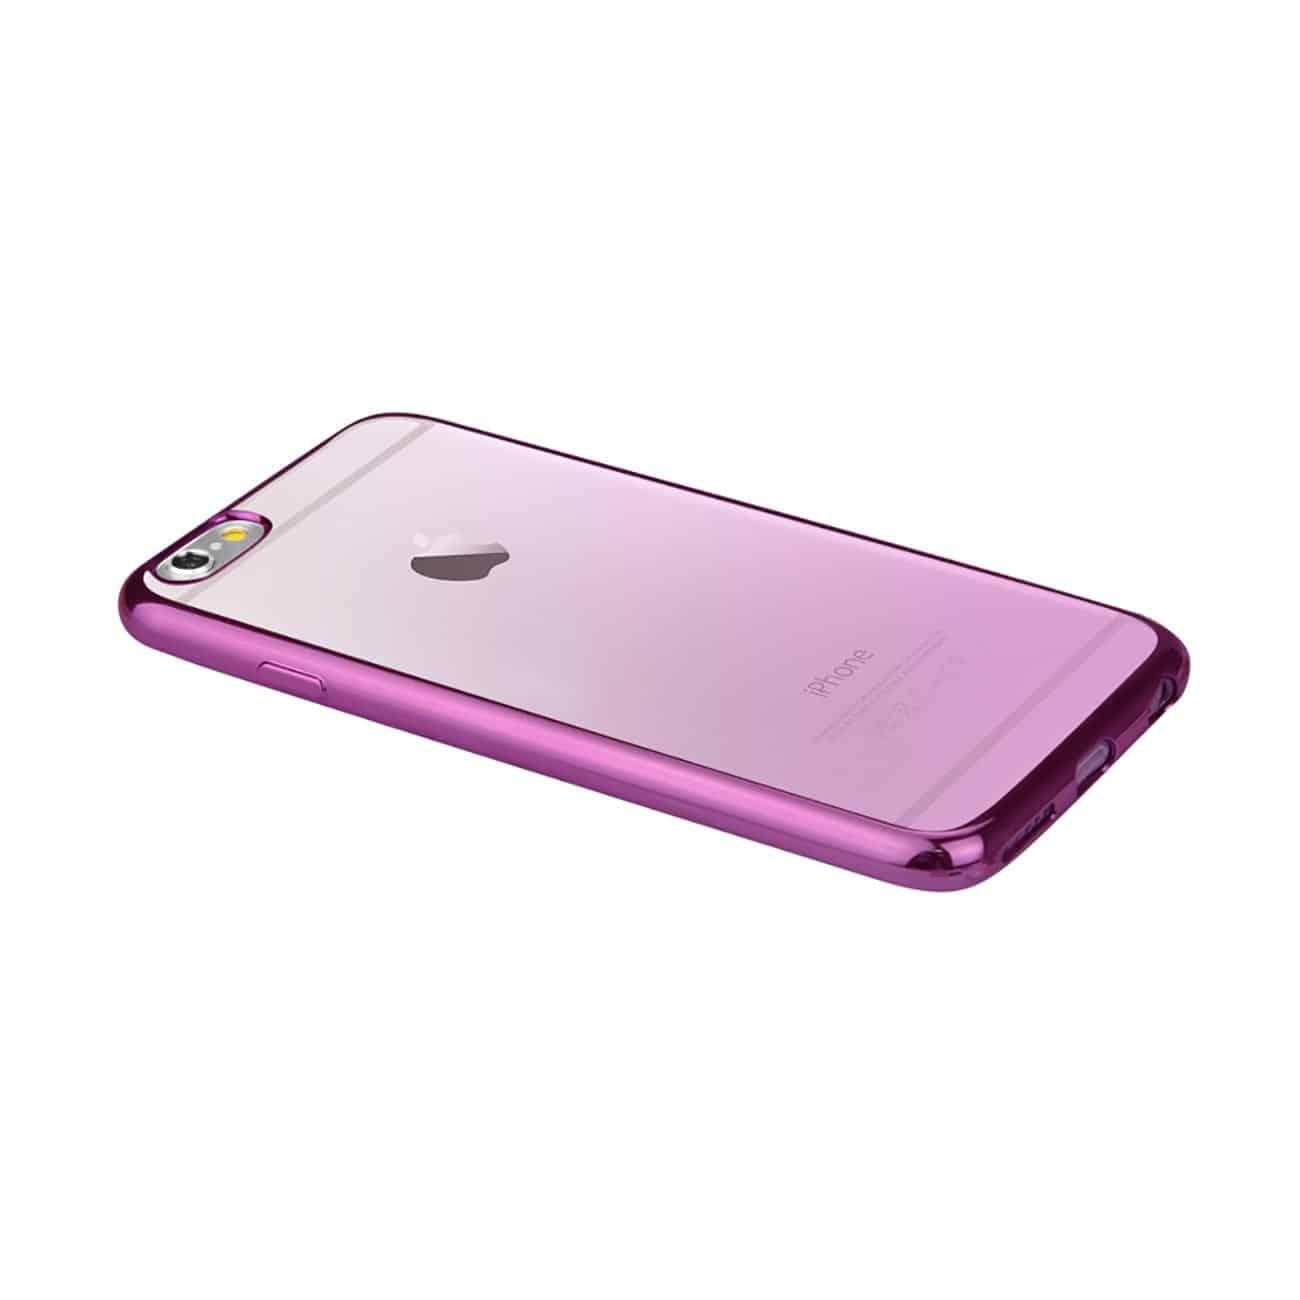 IPHONE 6 PLUS FRAME GRADIENT CLEAR GLITTER CASE IN PURPLE